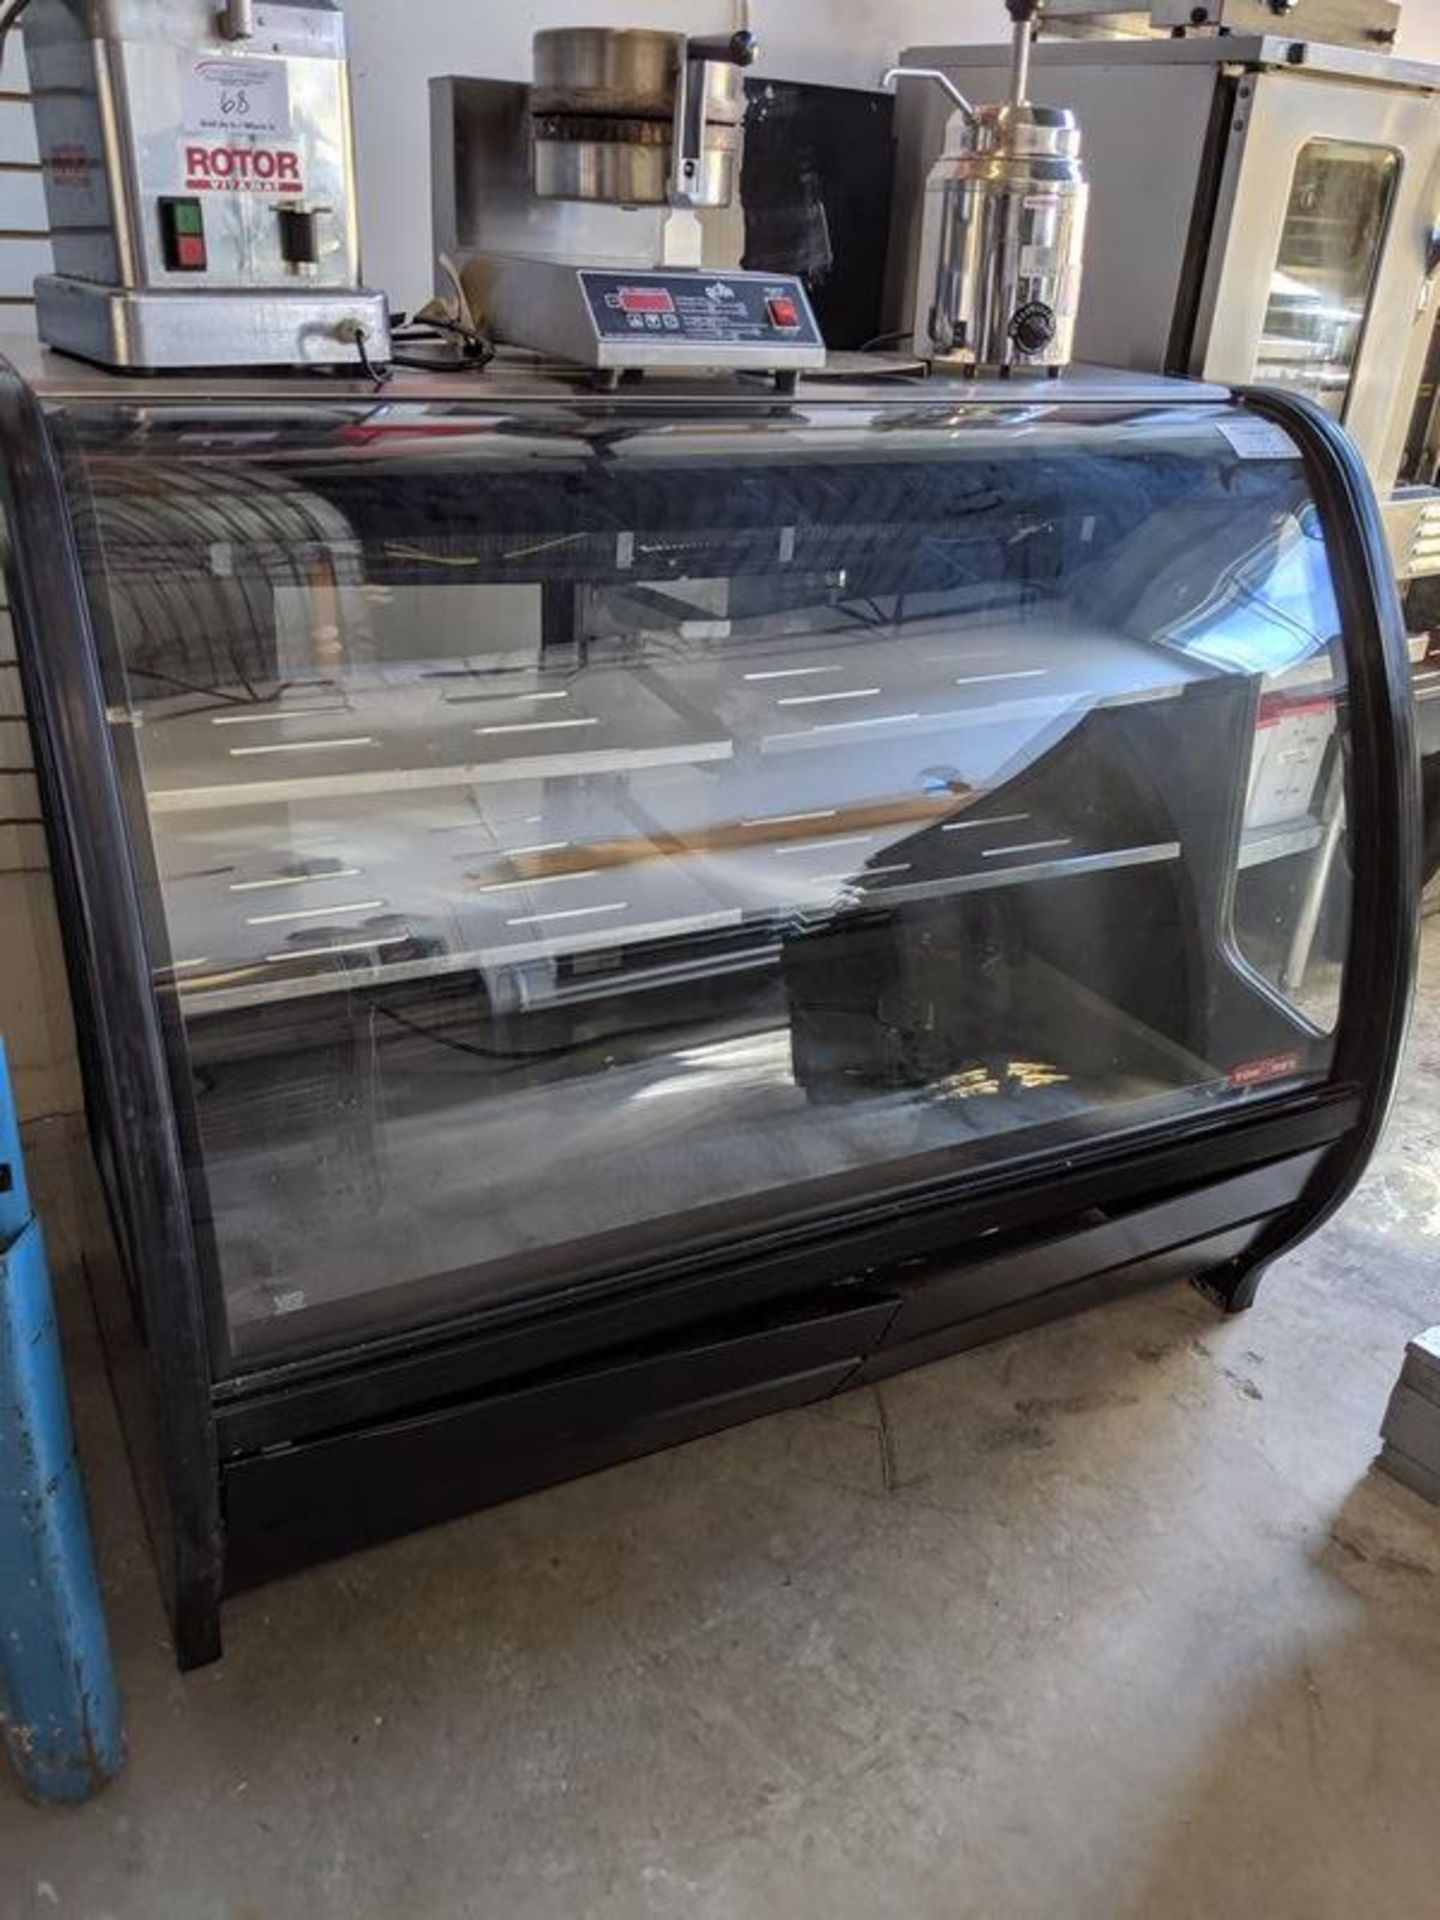 Lot 73 - Torrey Model TEM-150 Refrigerated Display Cooler